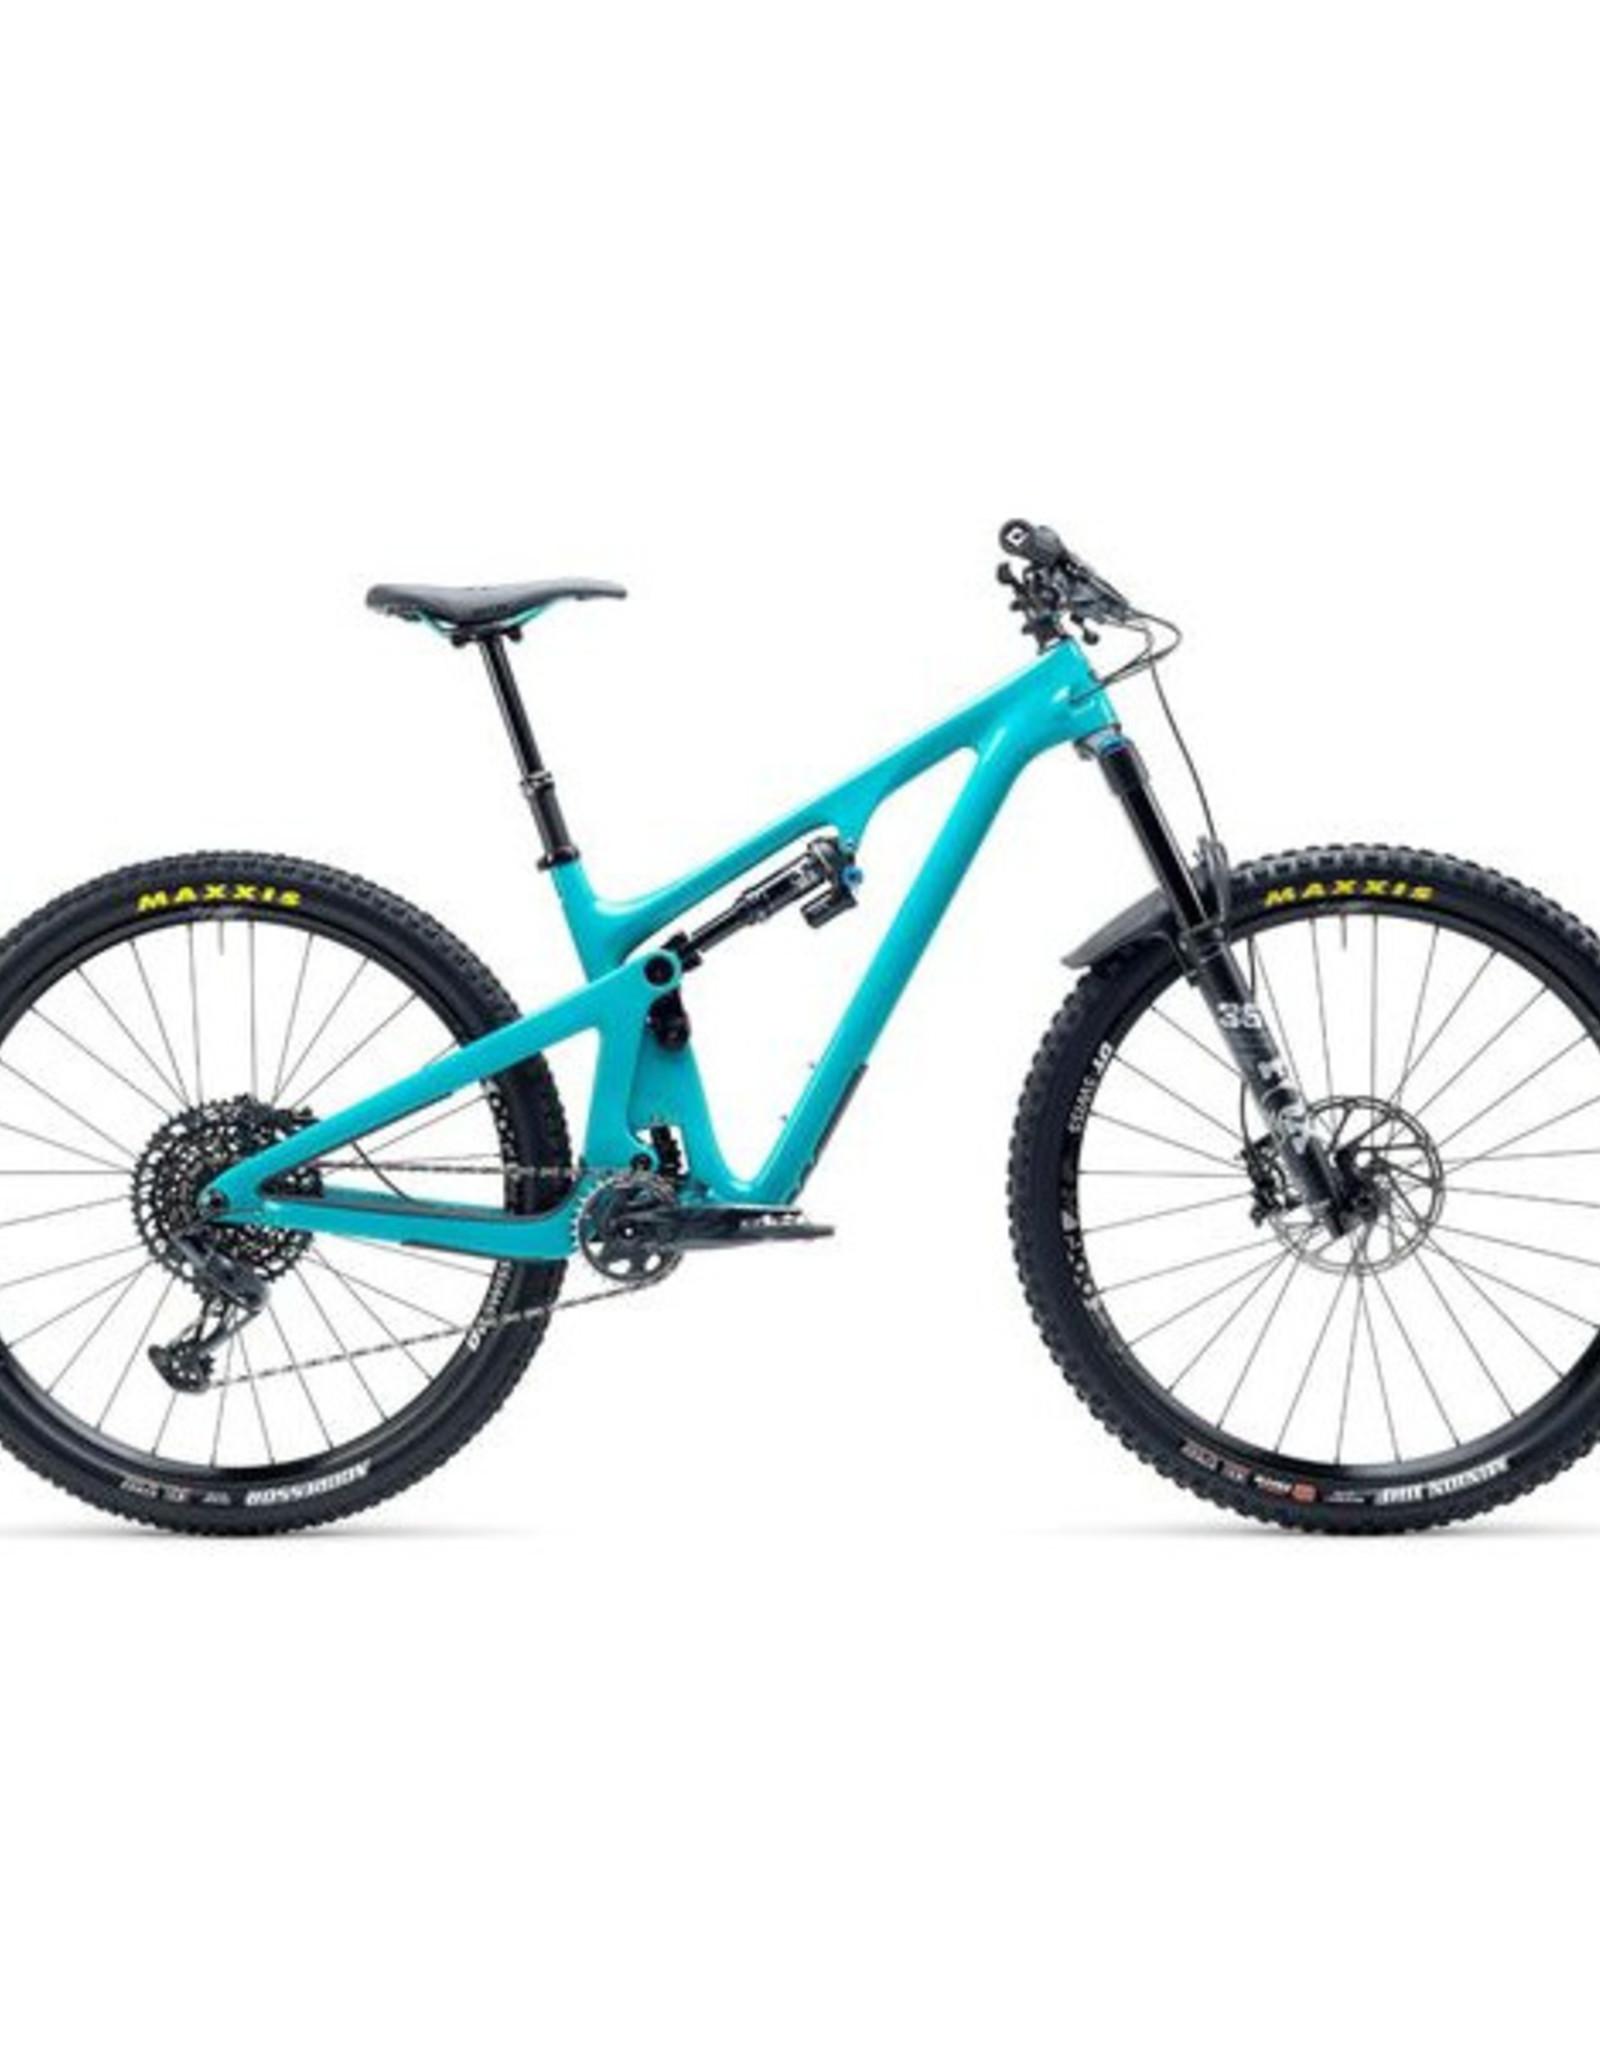 Yeti Cycles Yeti SB130, Carbon Series